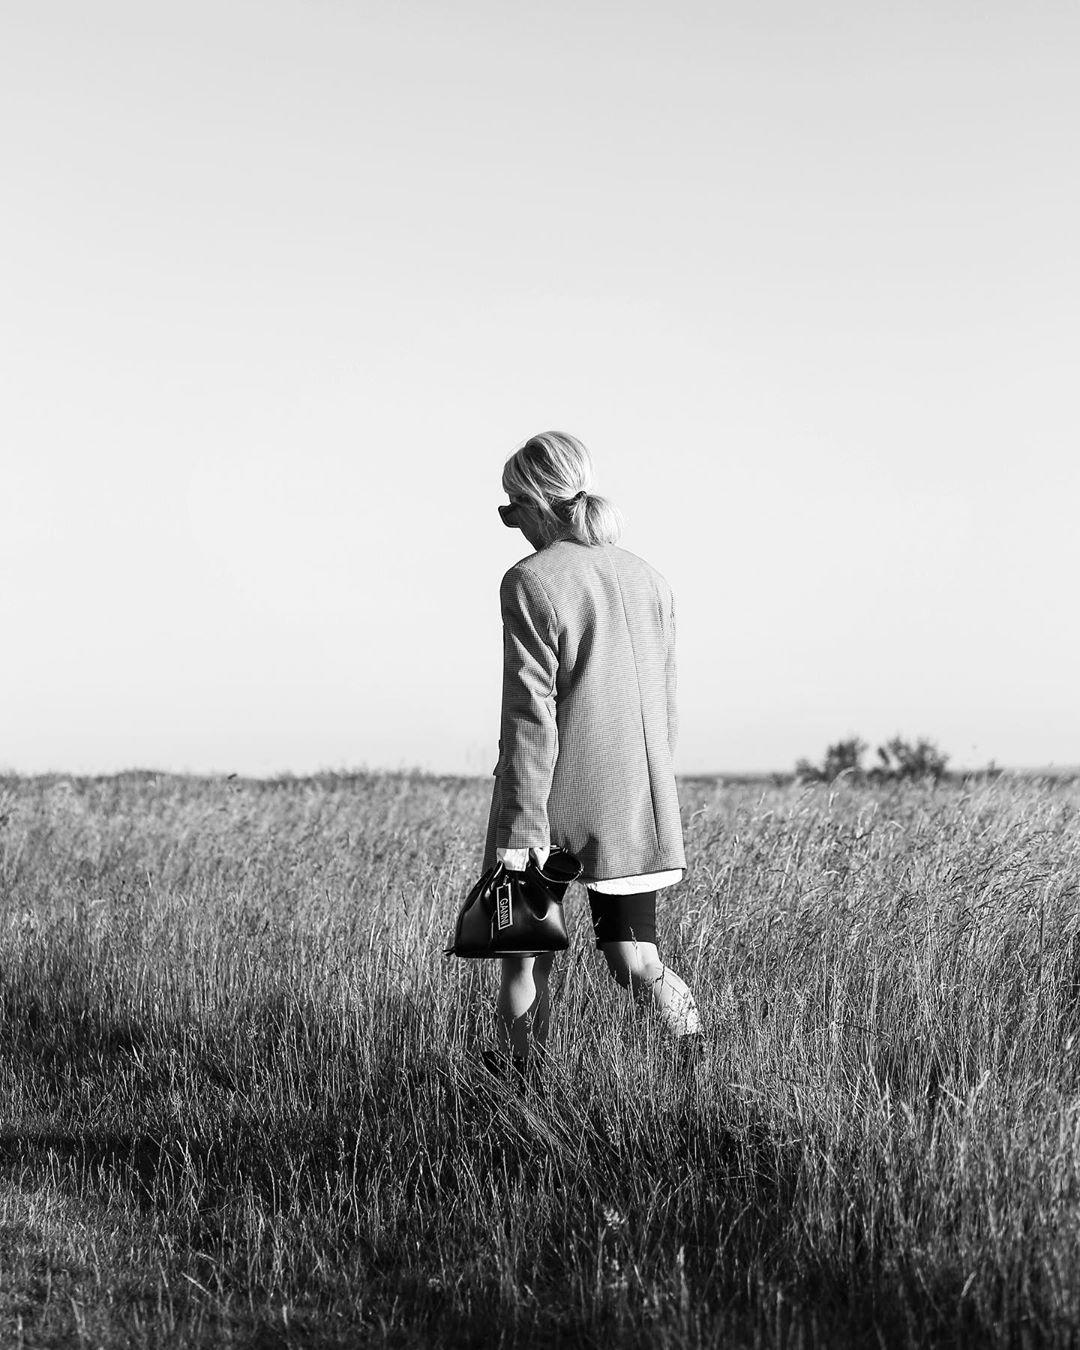 plaid jacket de Zara sur girl_from_town